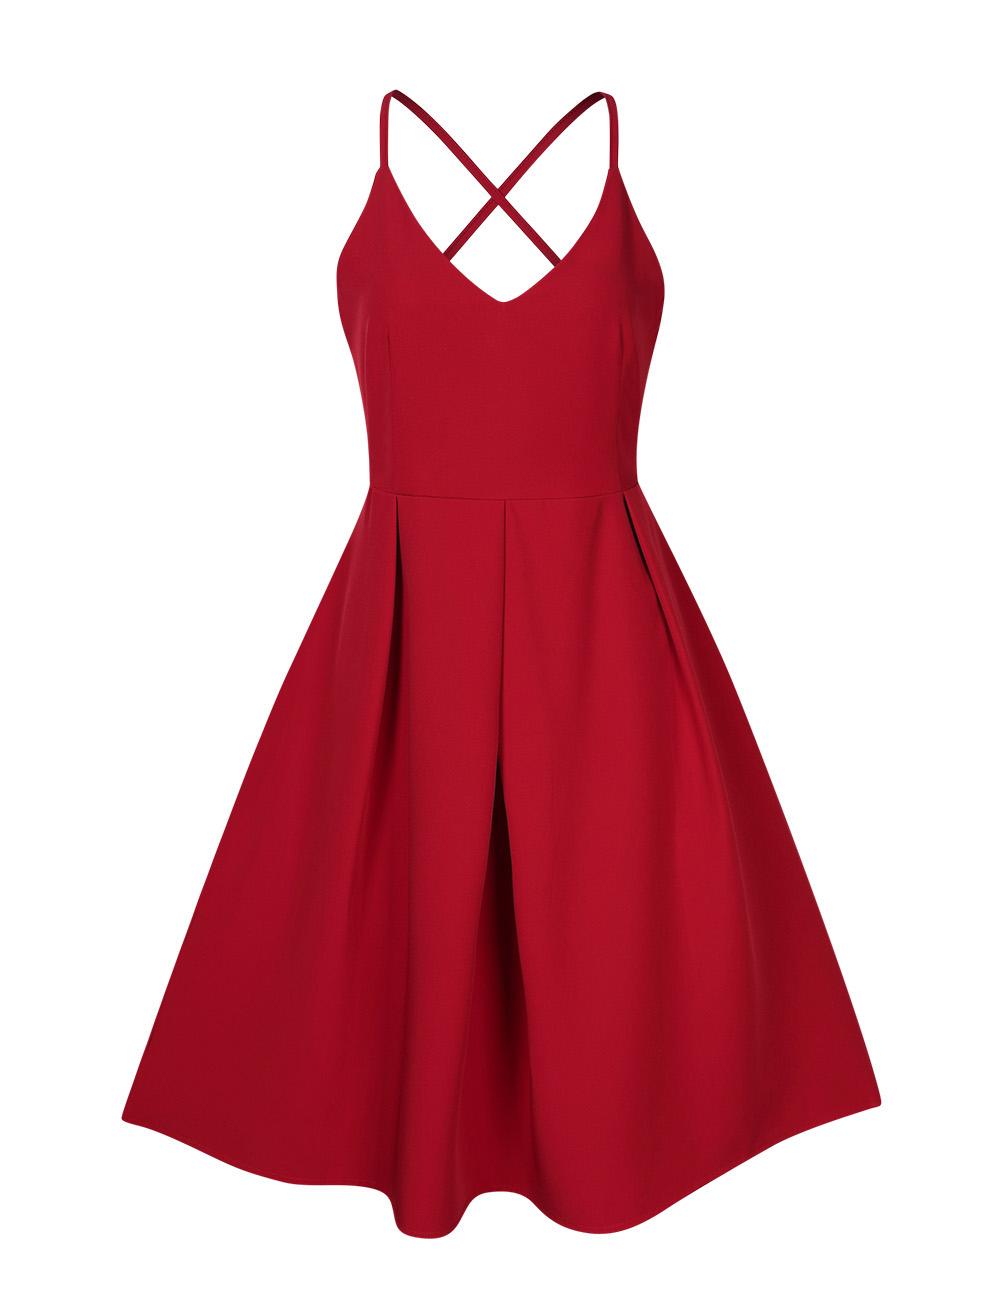 GlorySunshine Women Deep V-Neck Spaghetti Strap Dress Sleeveless Sexy Summer Cocktail Party Dresses Red_S